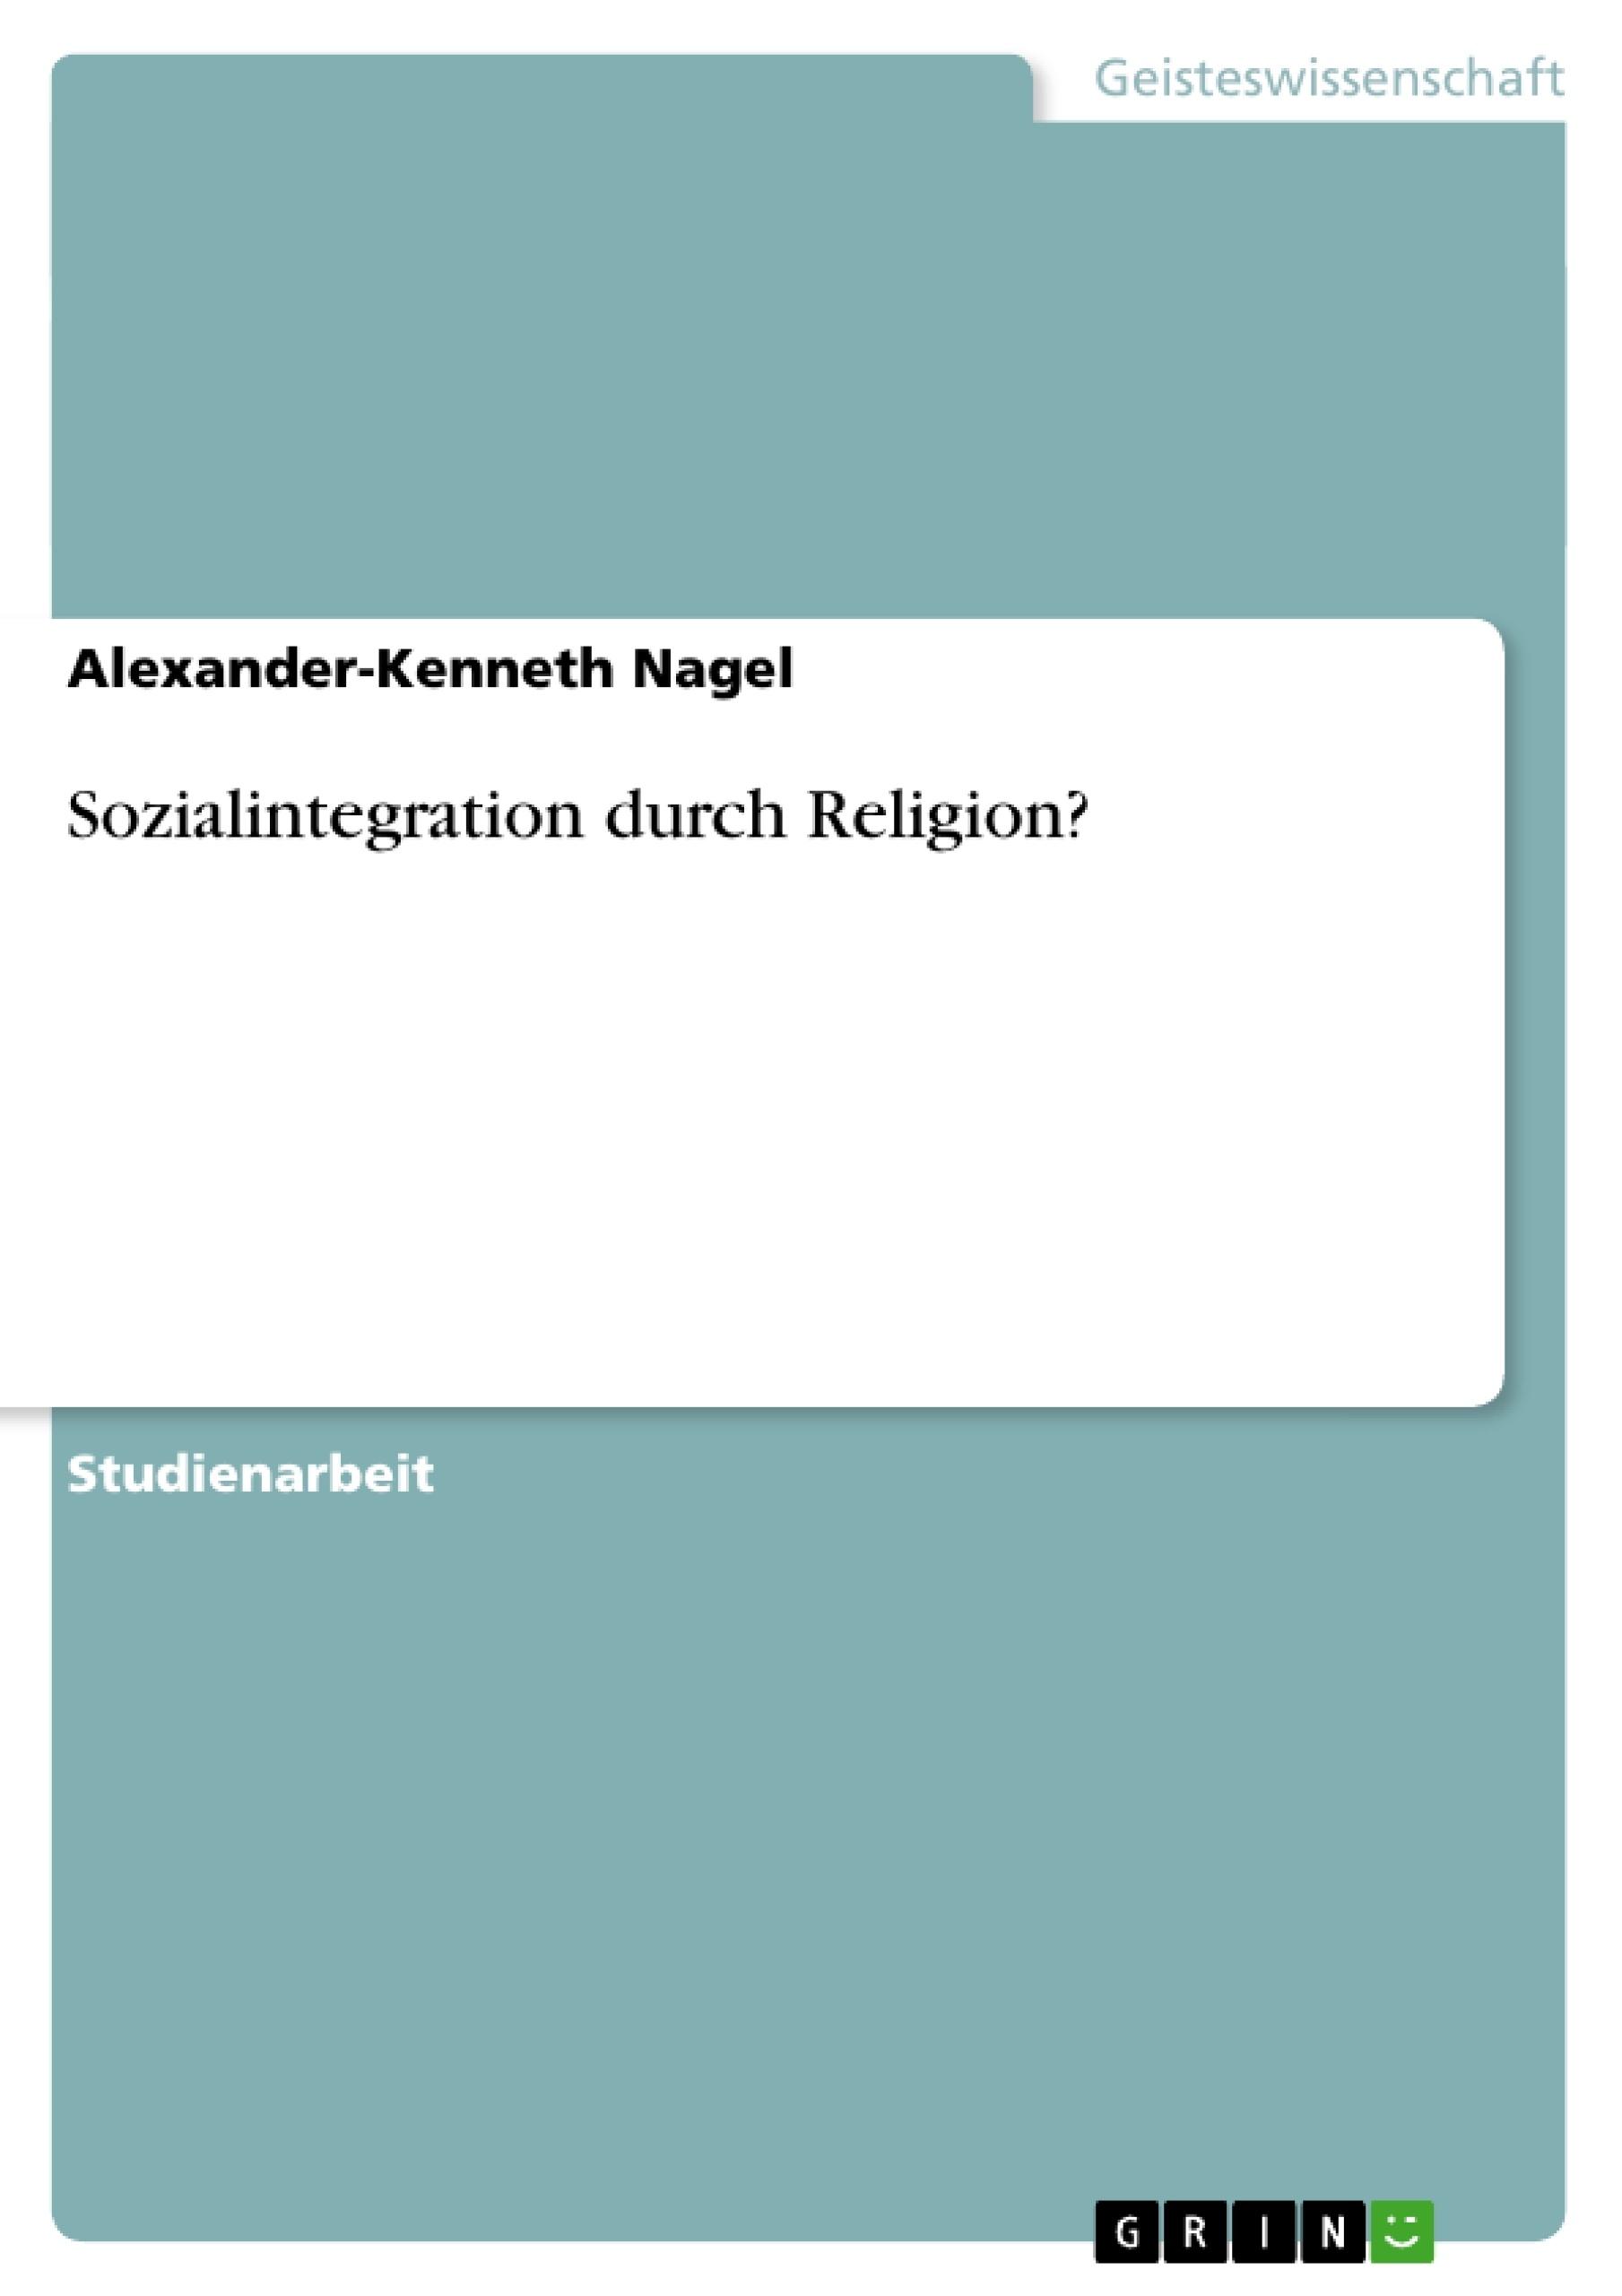 Titel: Sozialintegration durch Religion?